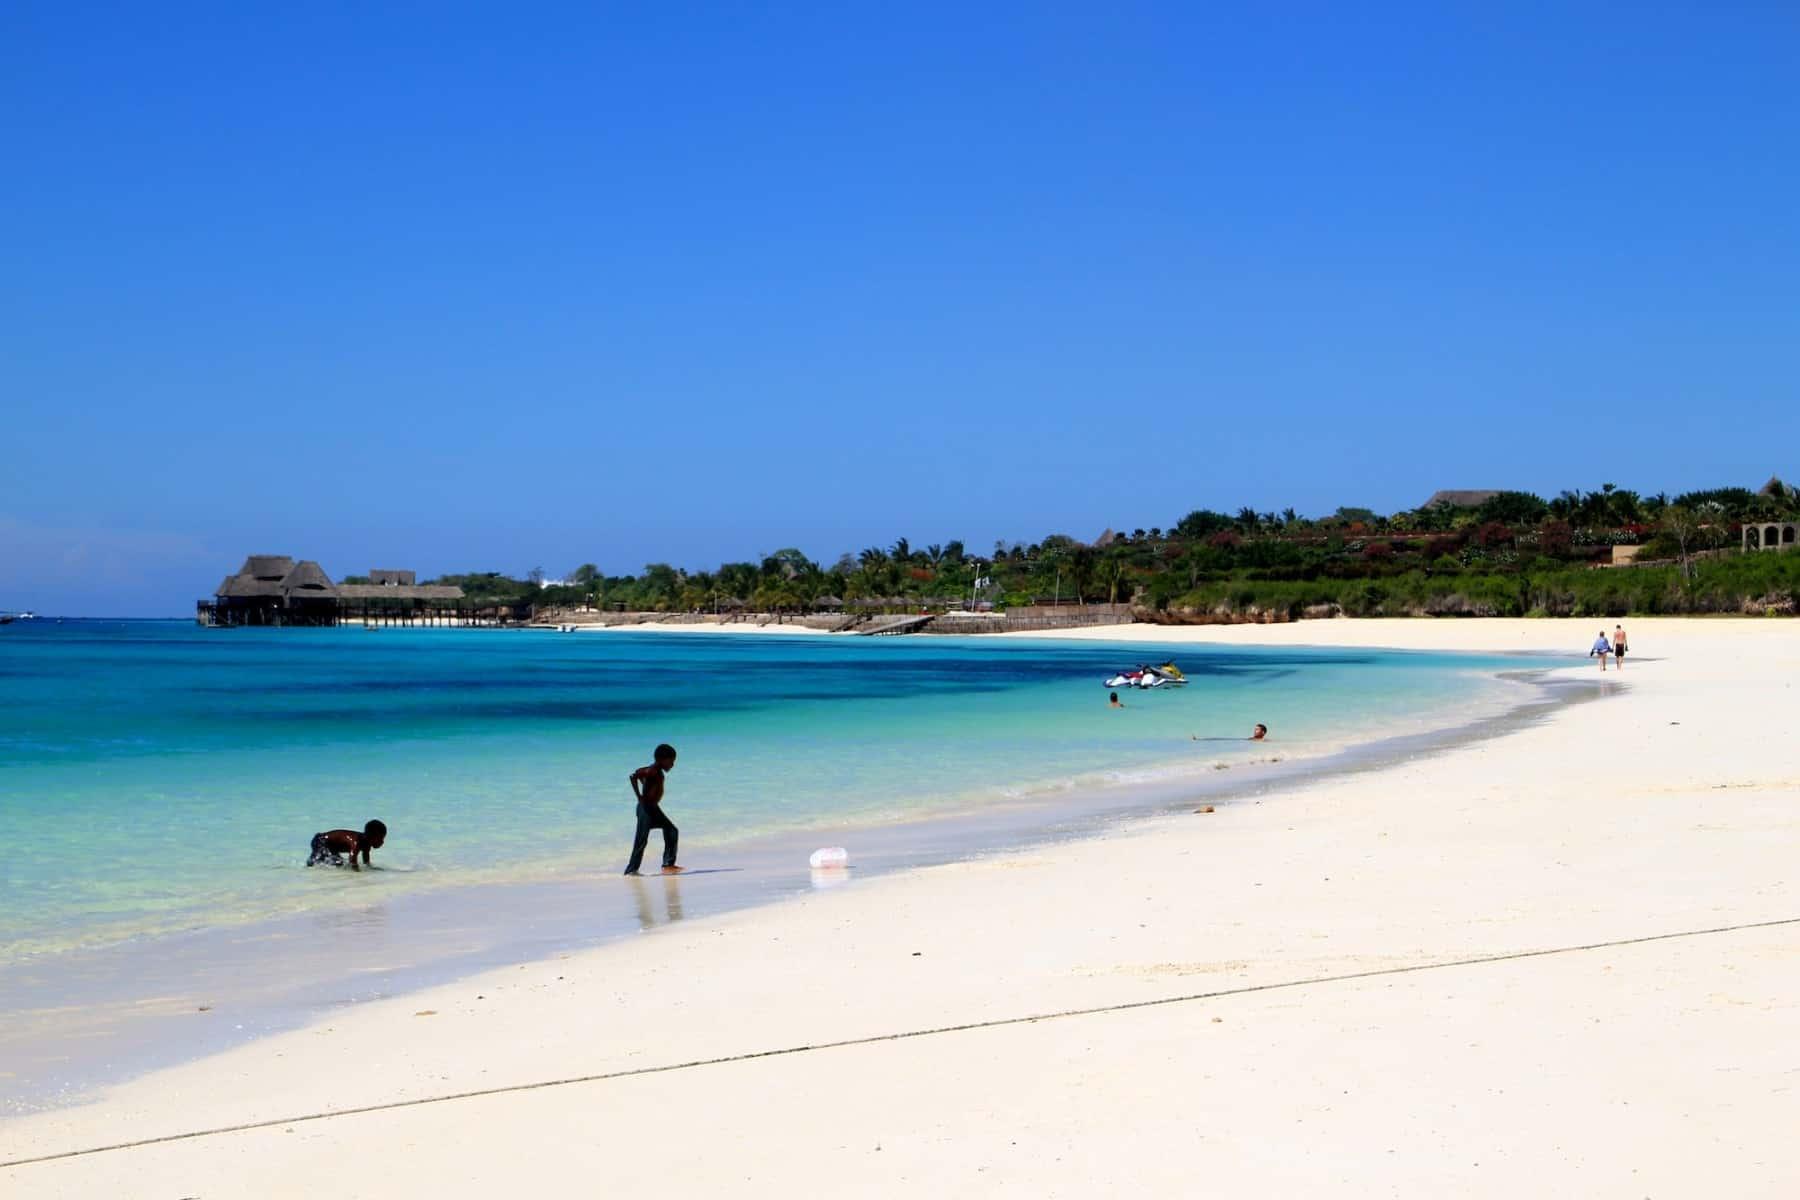 Circuito Zanzibar : Kilimanjaro safari zanzibar 18 days viva africa tours